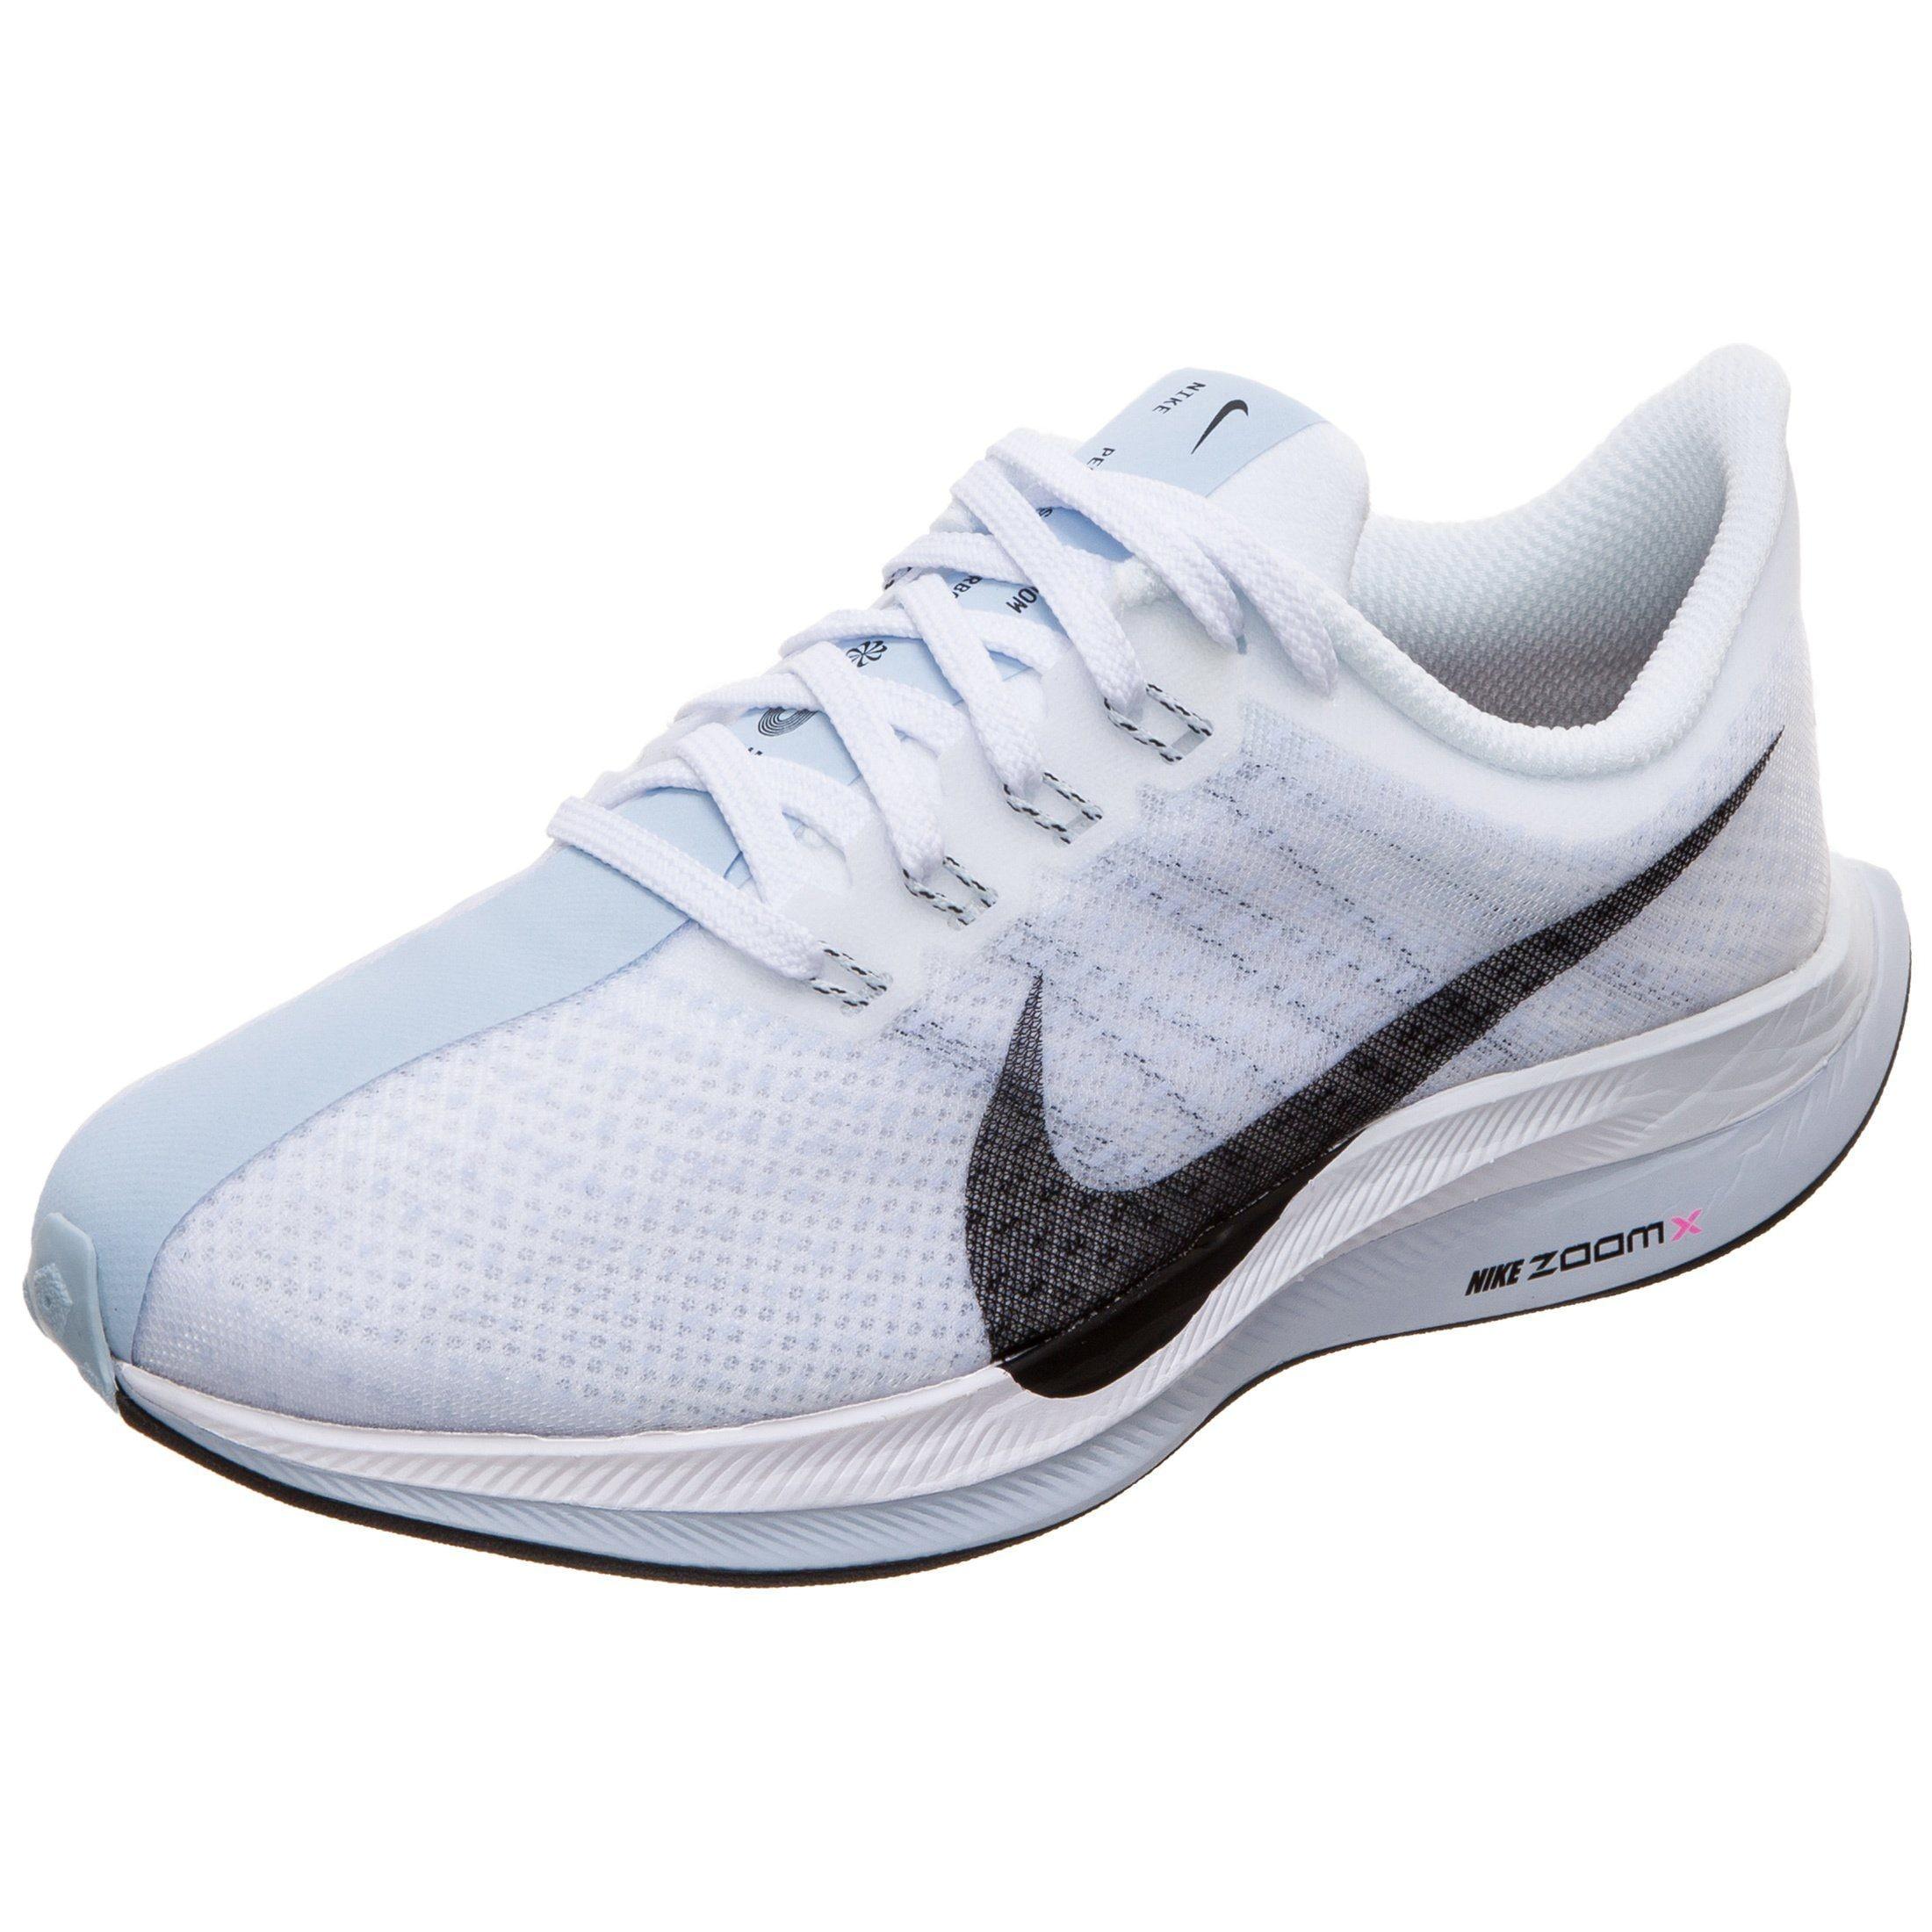 Nike Laufschuh »Air Zoom Pegasus 35« auf Raten | BAUR